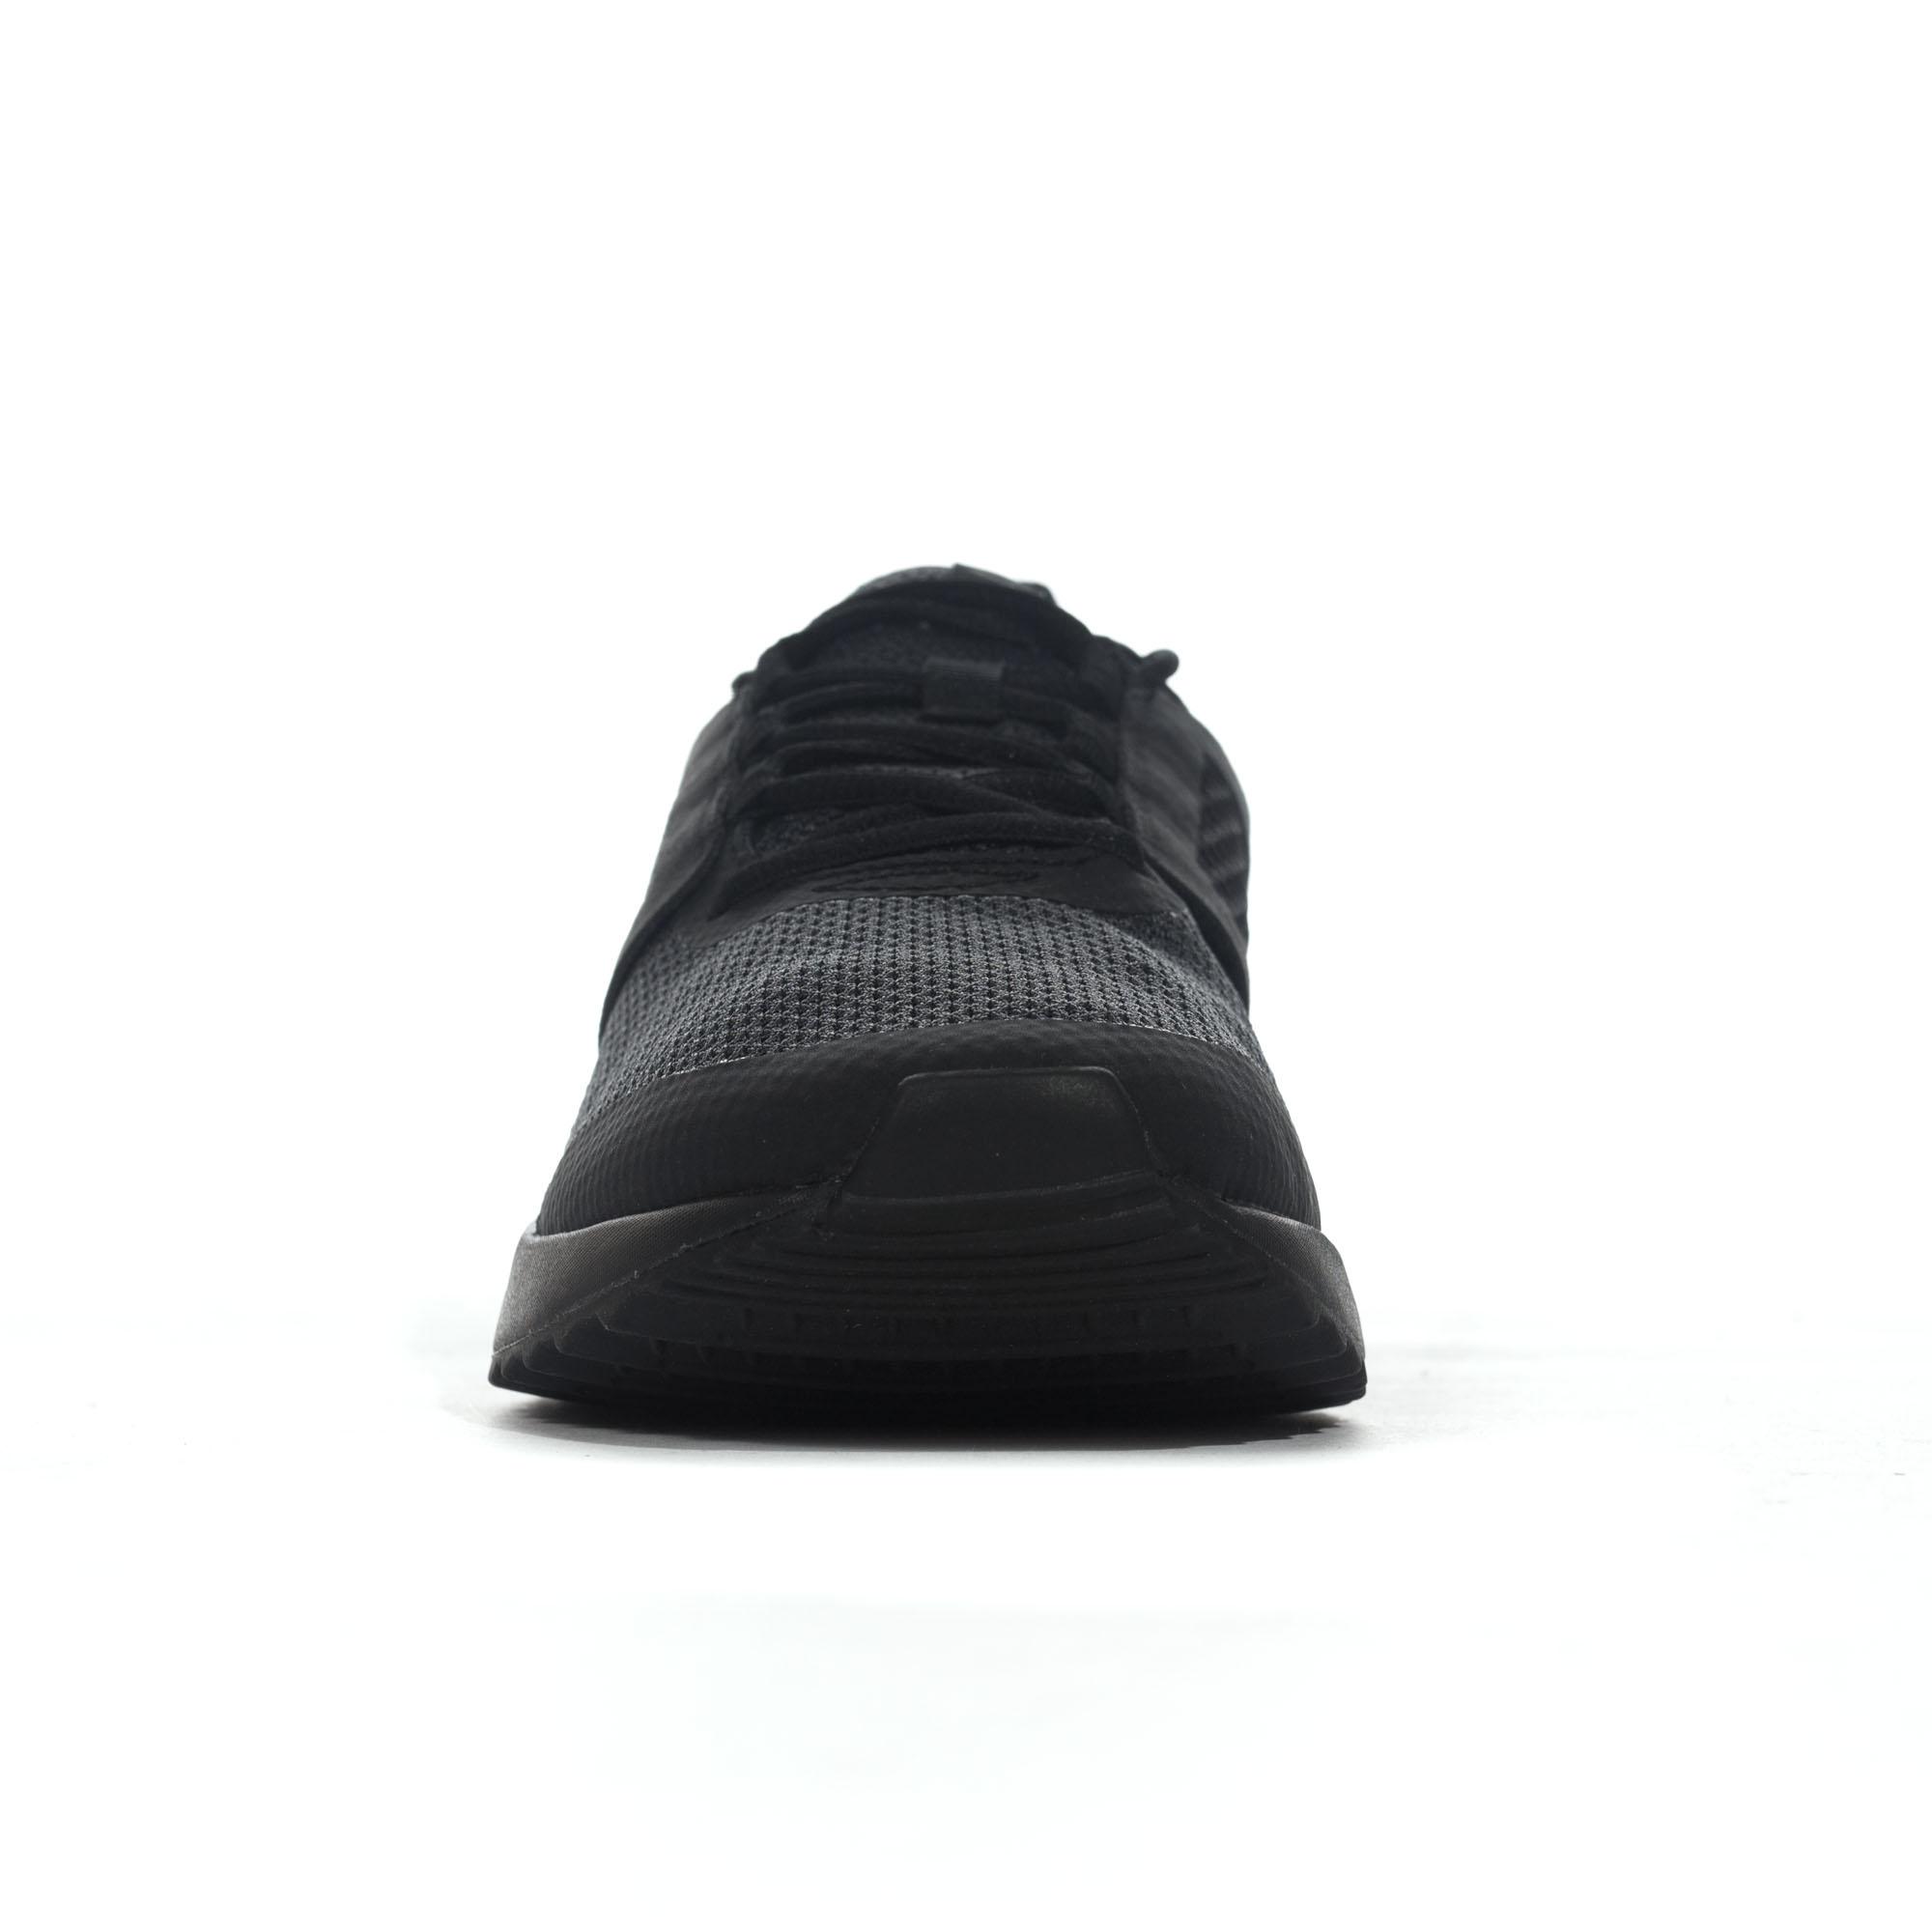 Puma Pacer prochaine Net Homme Homme Homme Sport Fashion Trainer Shoe Black 8ebb23